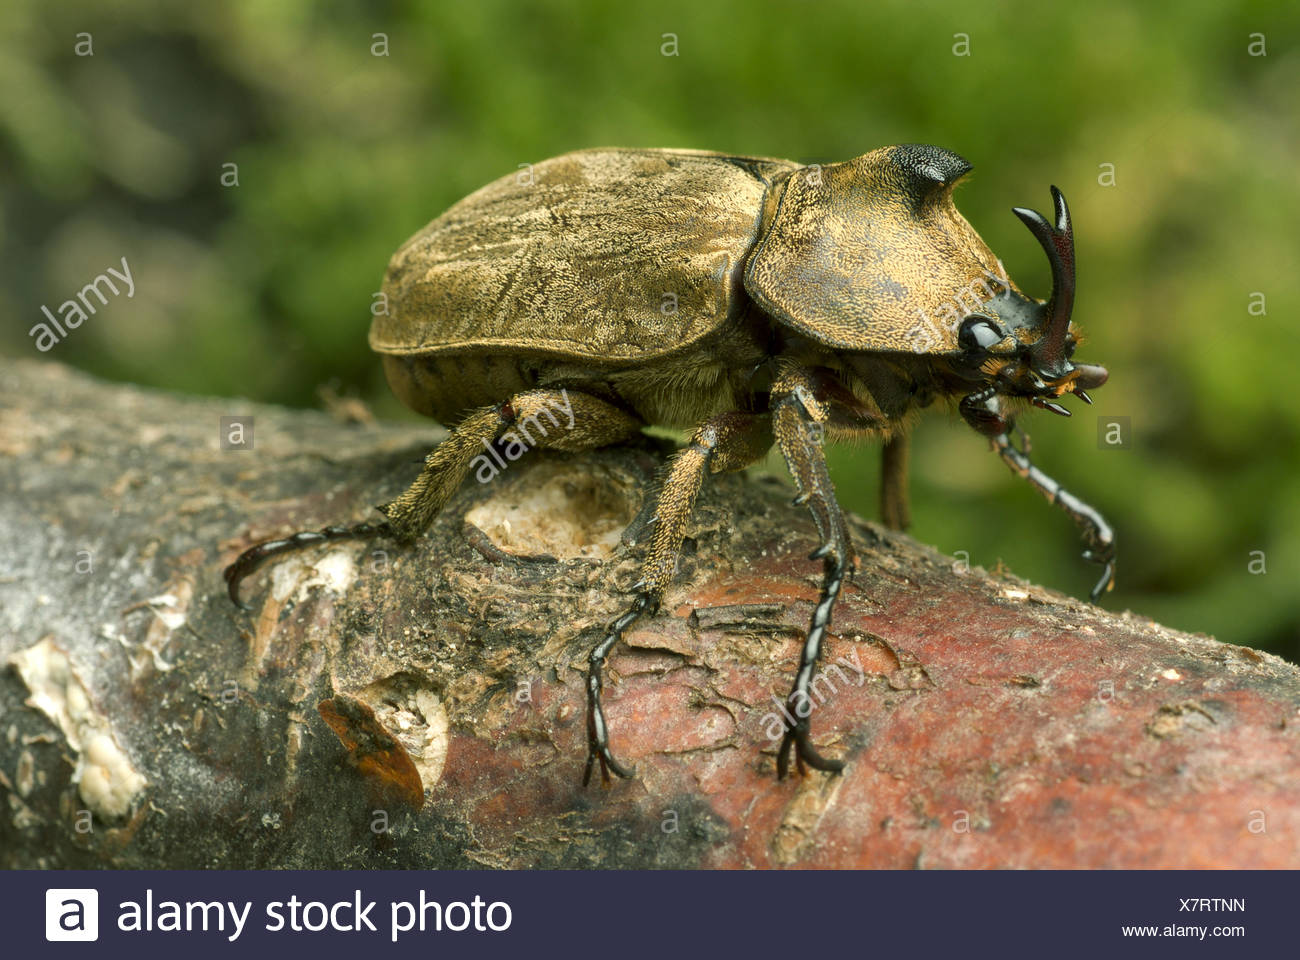 Pfeiffer's rhinoceros beetle, Pfeiffer's horned beetle (Trypoxylus pfeifferi, Allomyrina pfeifferi), male, close-up view Stock Photo